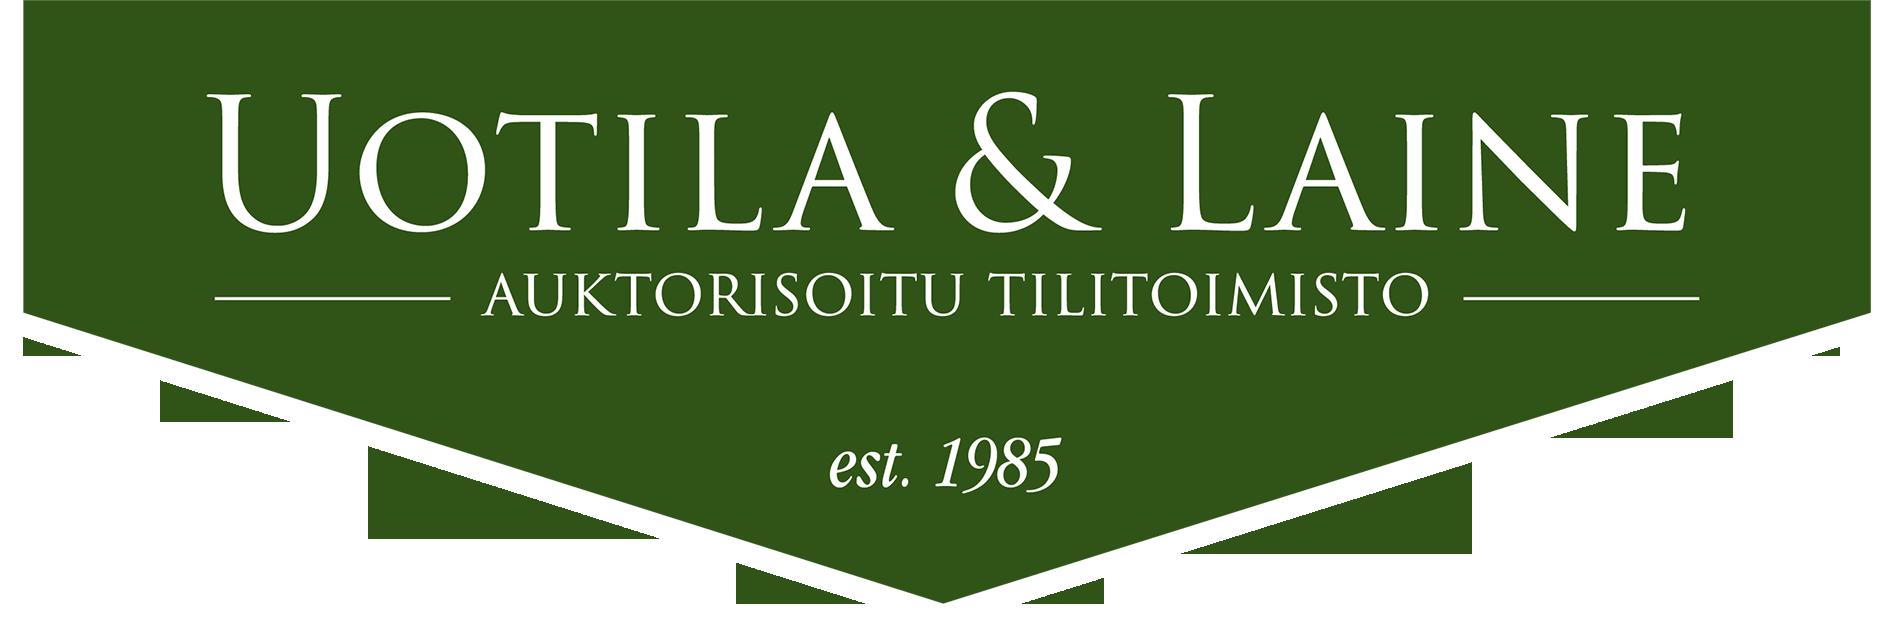 Uotila & Laine